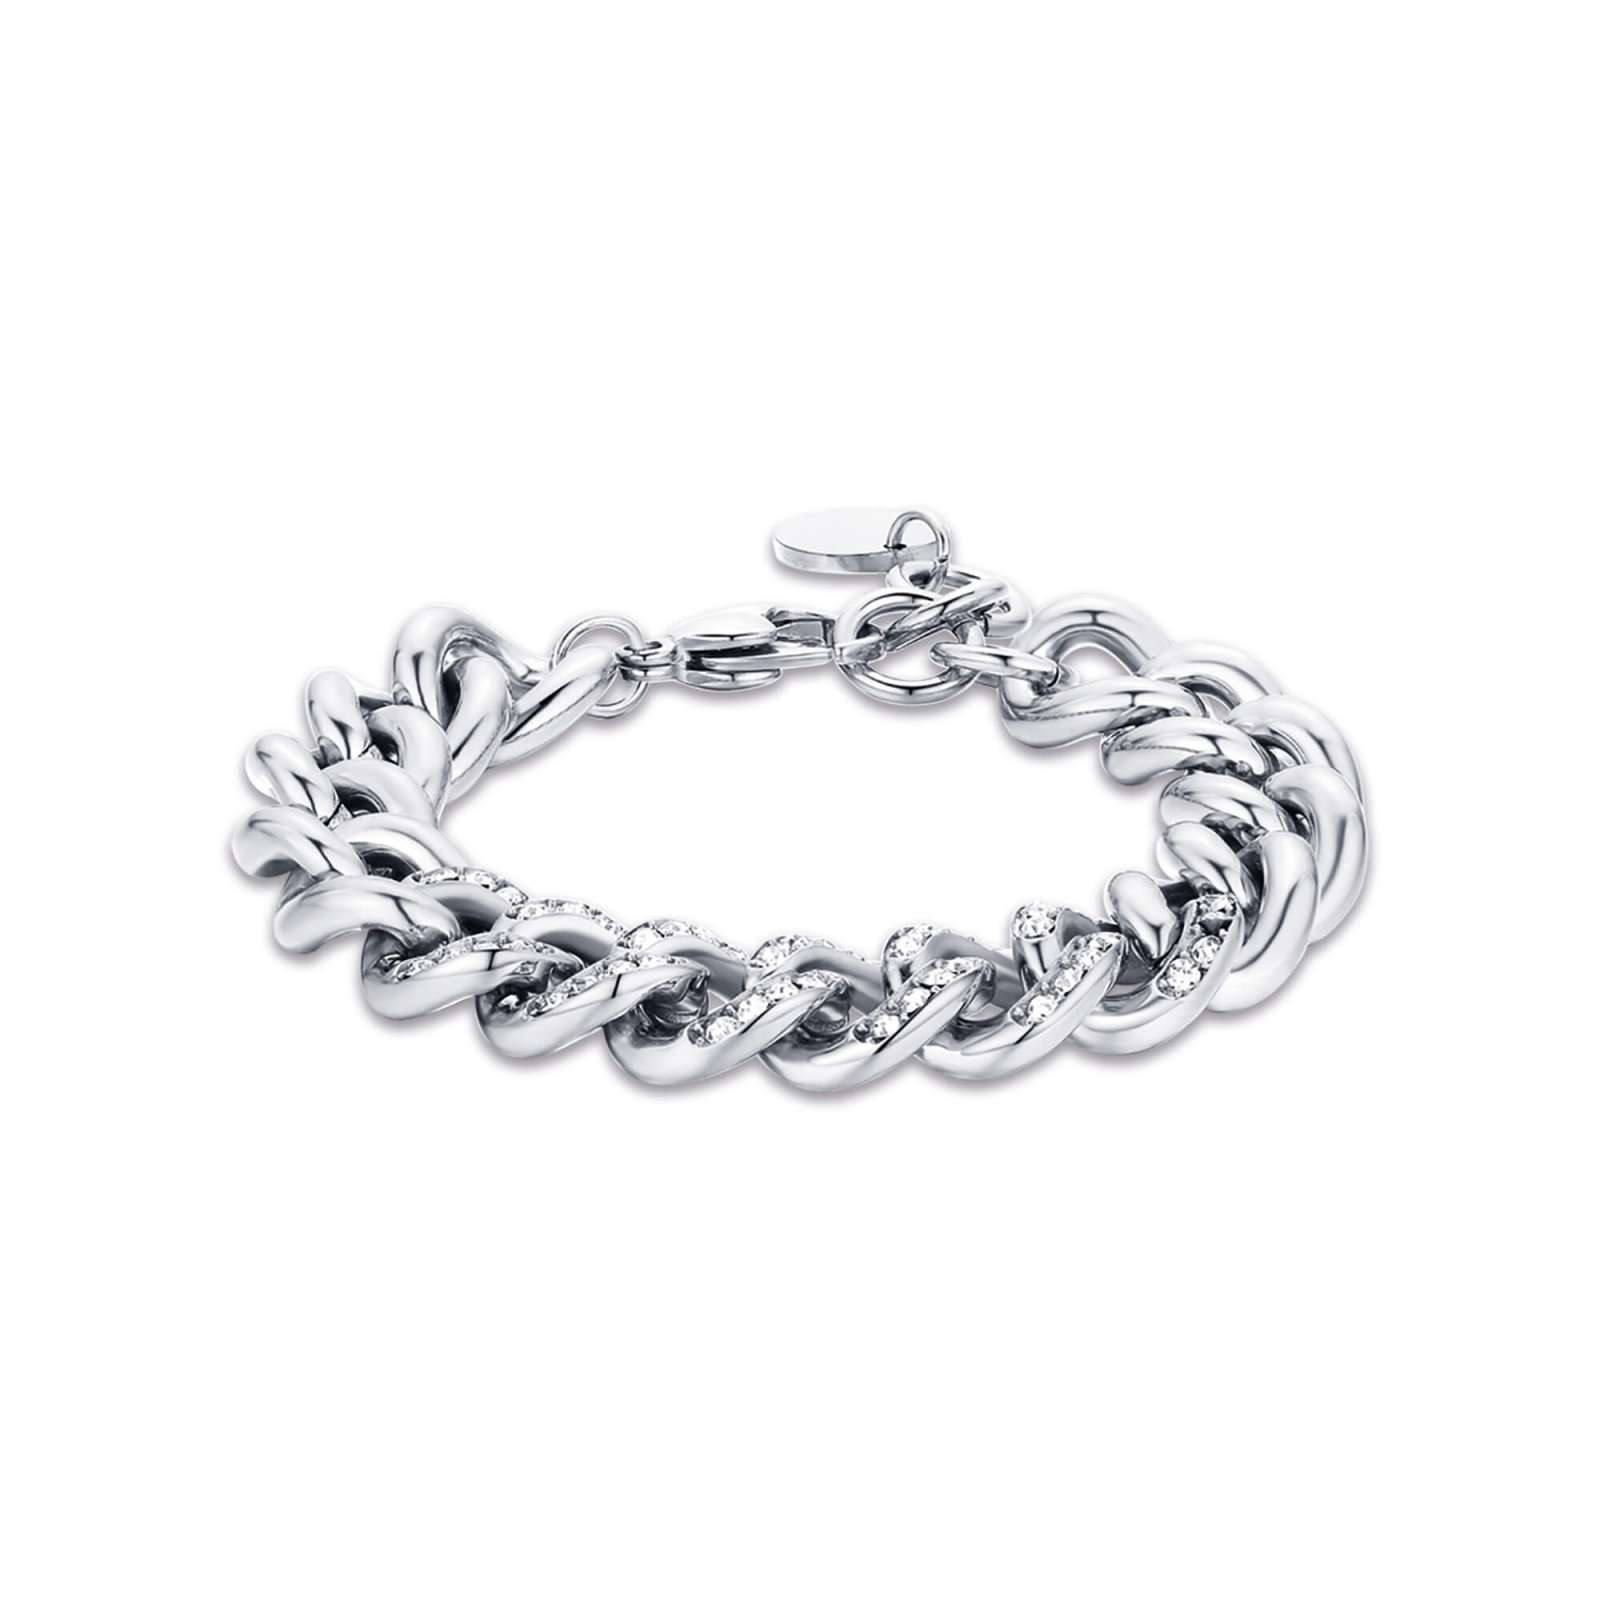 Luca Barra - Bracciale in acciaio con cristalli bianchi